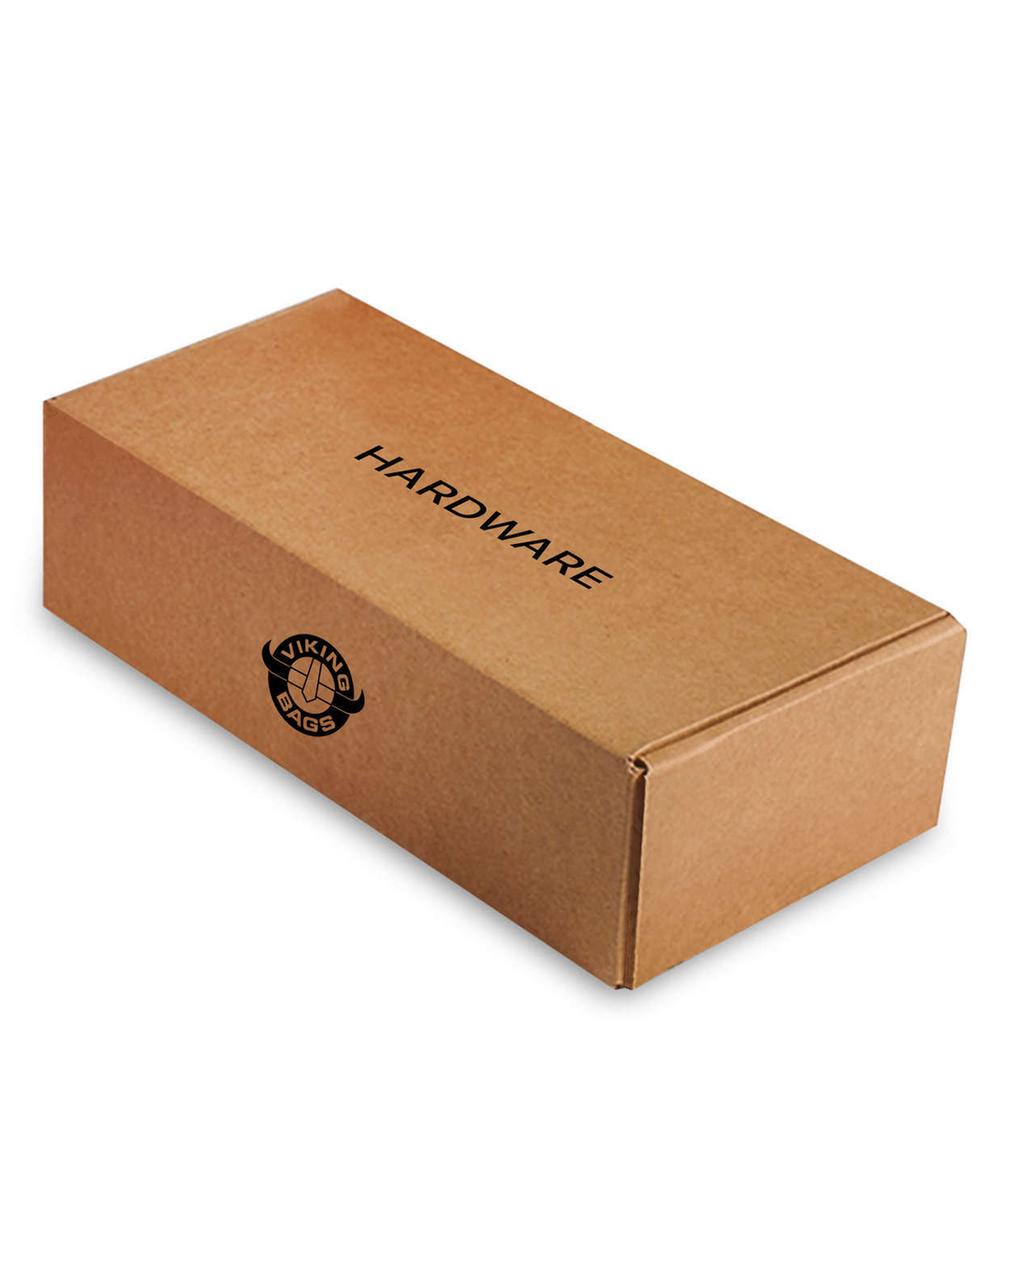 Honda VTX 1800 F Charger Slanted M Motorcycle Saddlebags Hardware Box